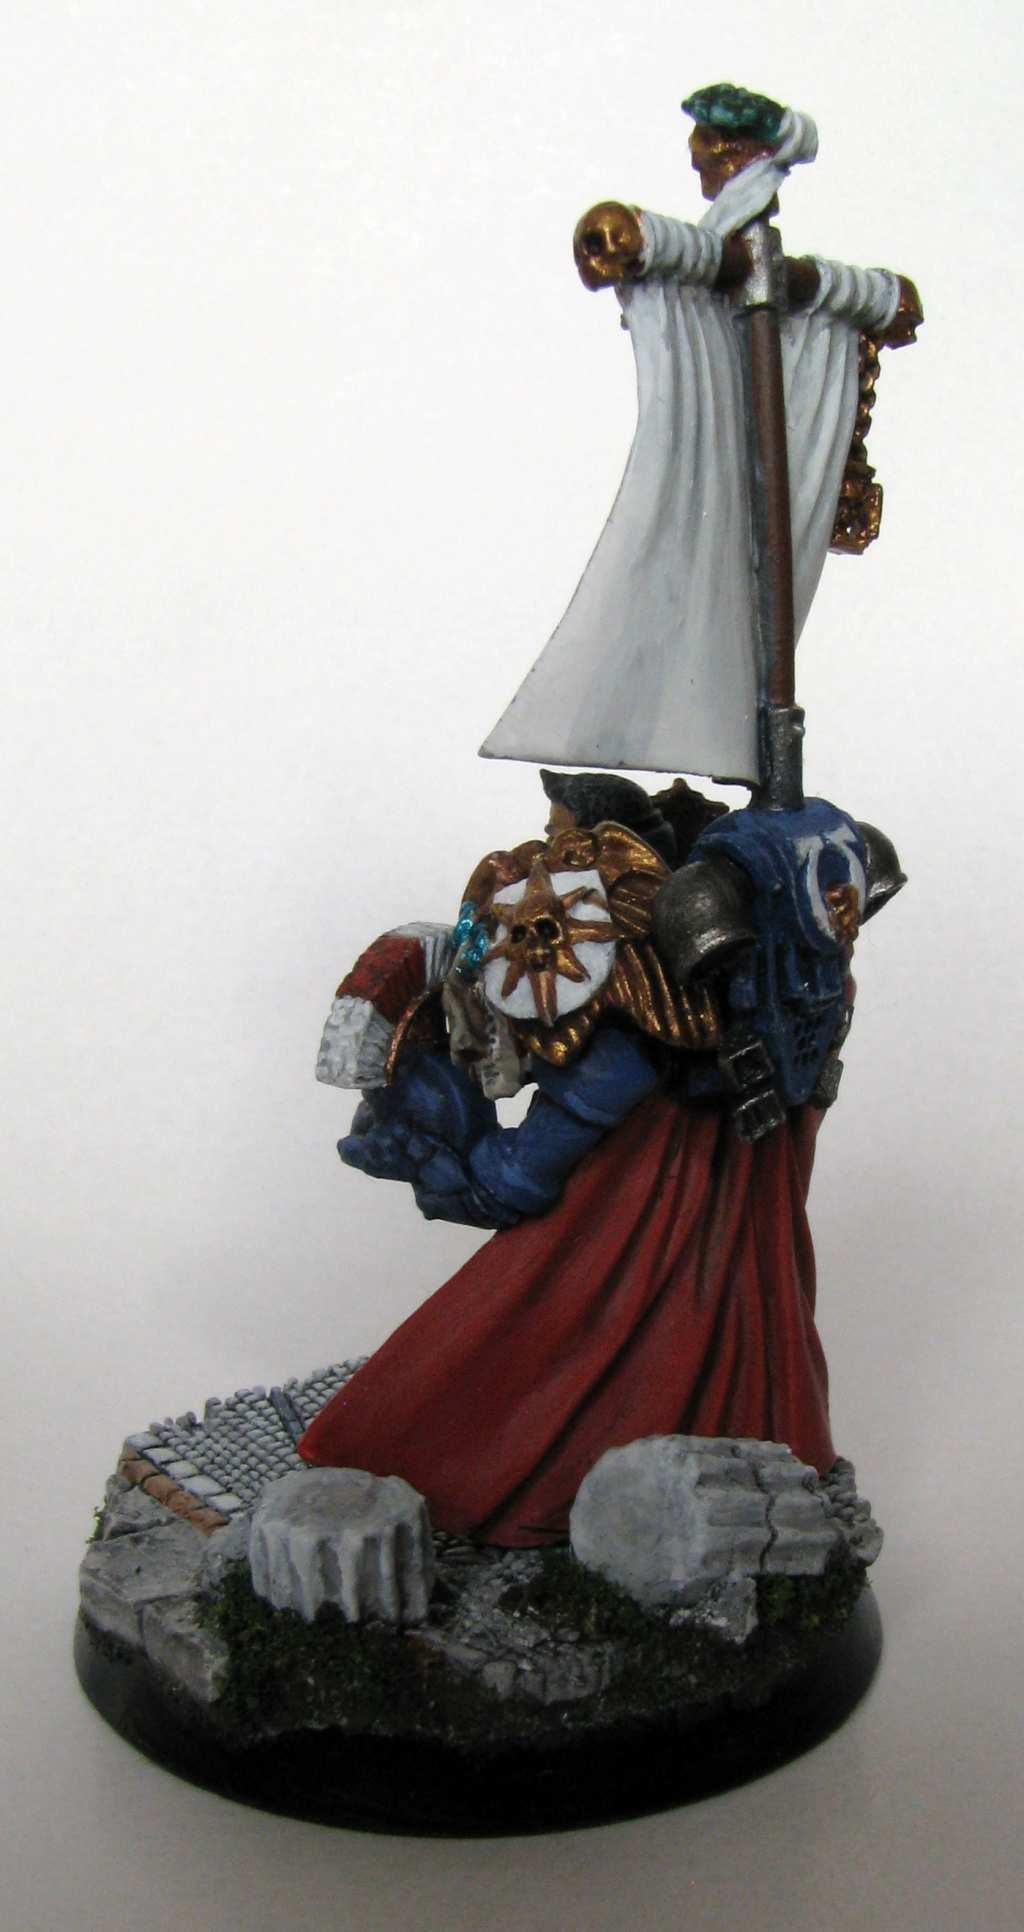 Space Marine Captain Sicarius by Pawel